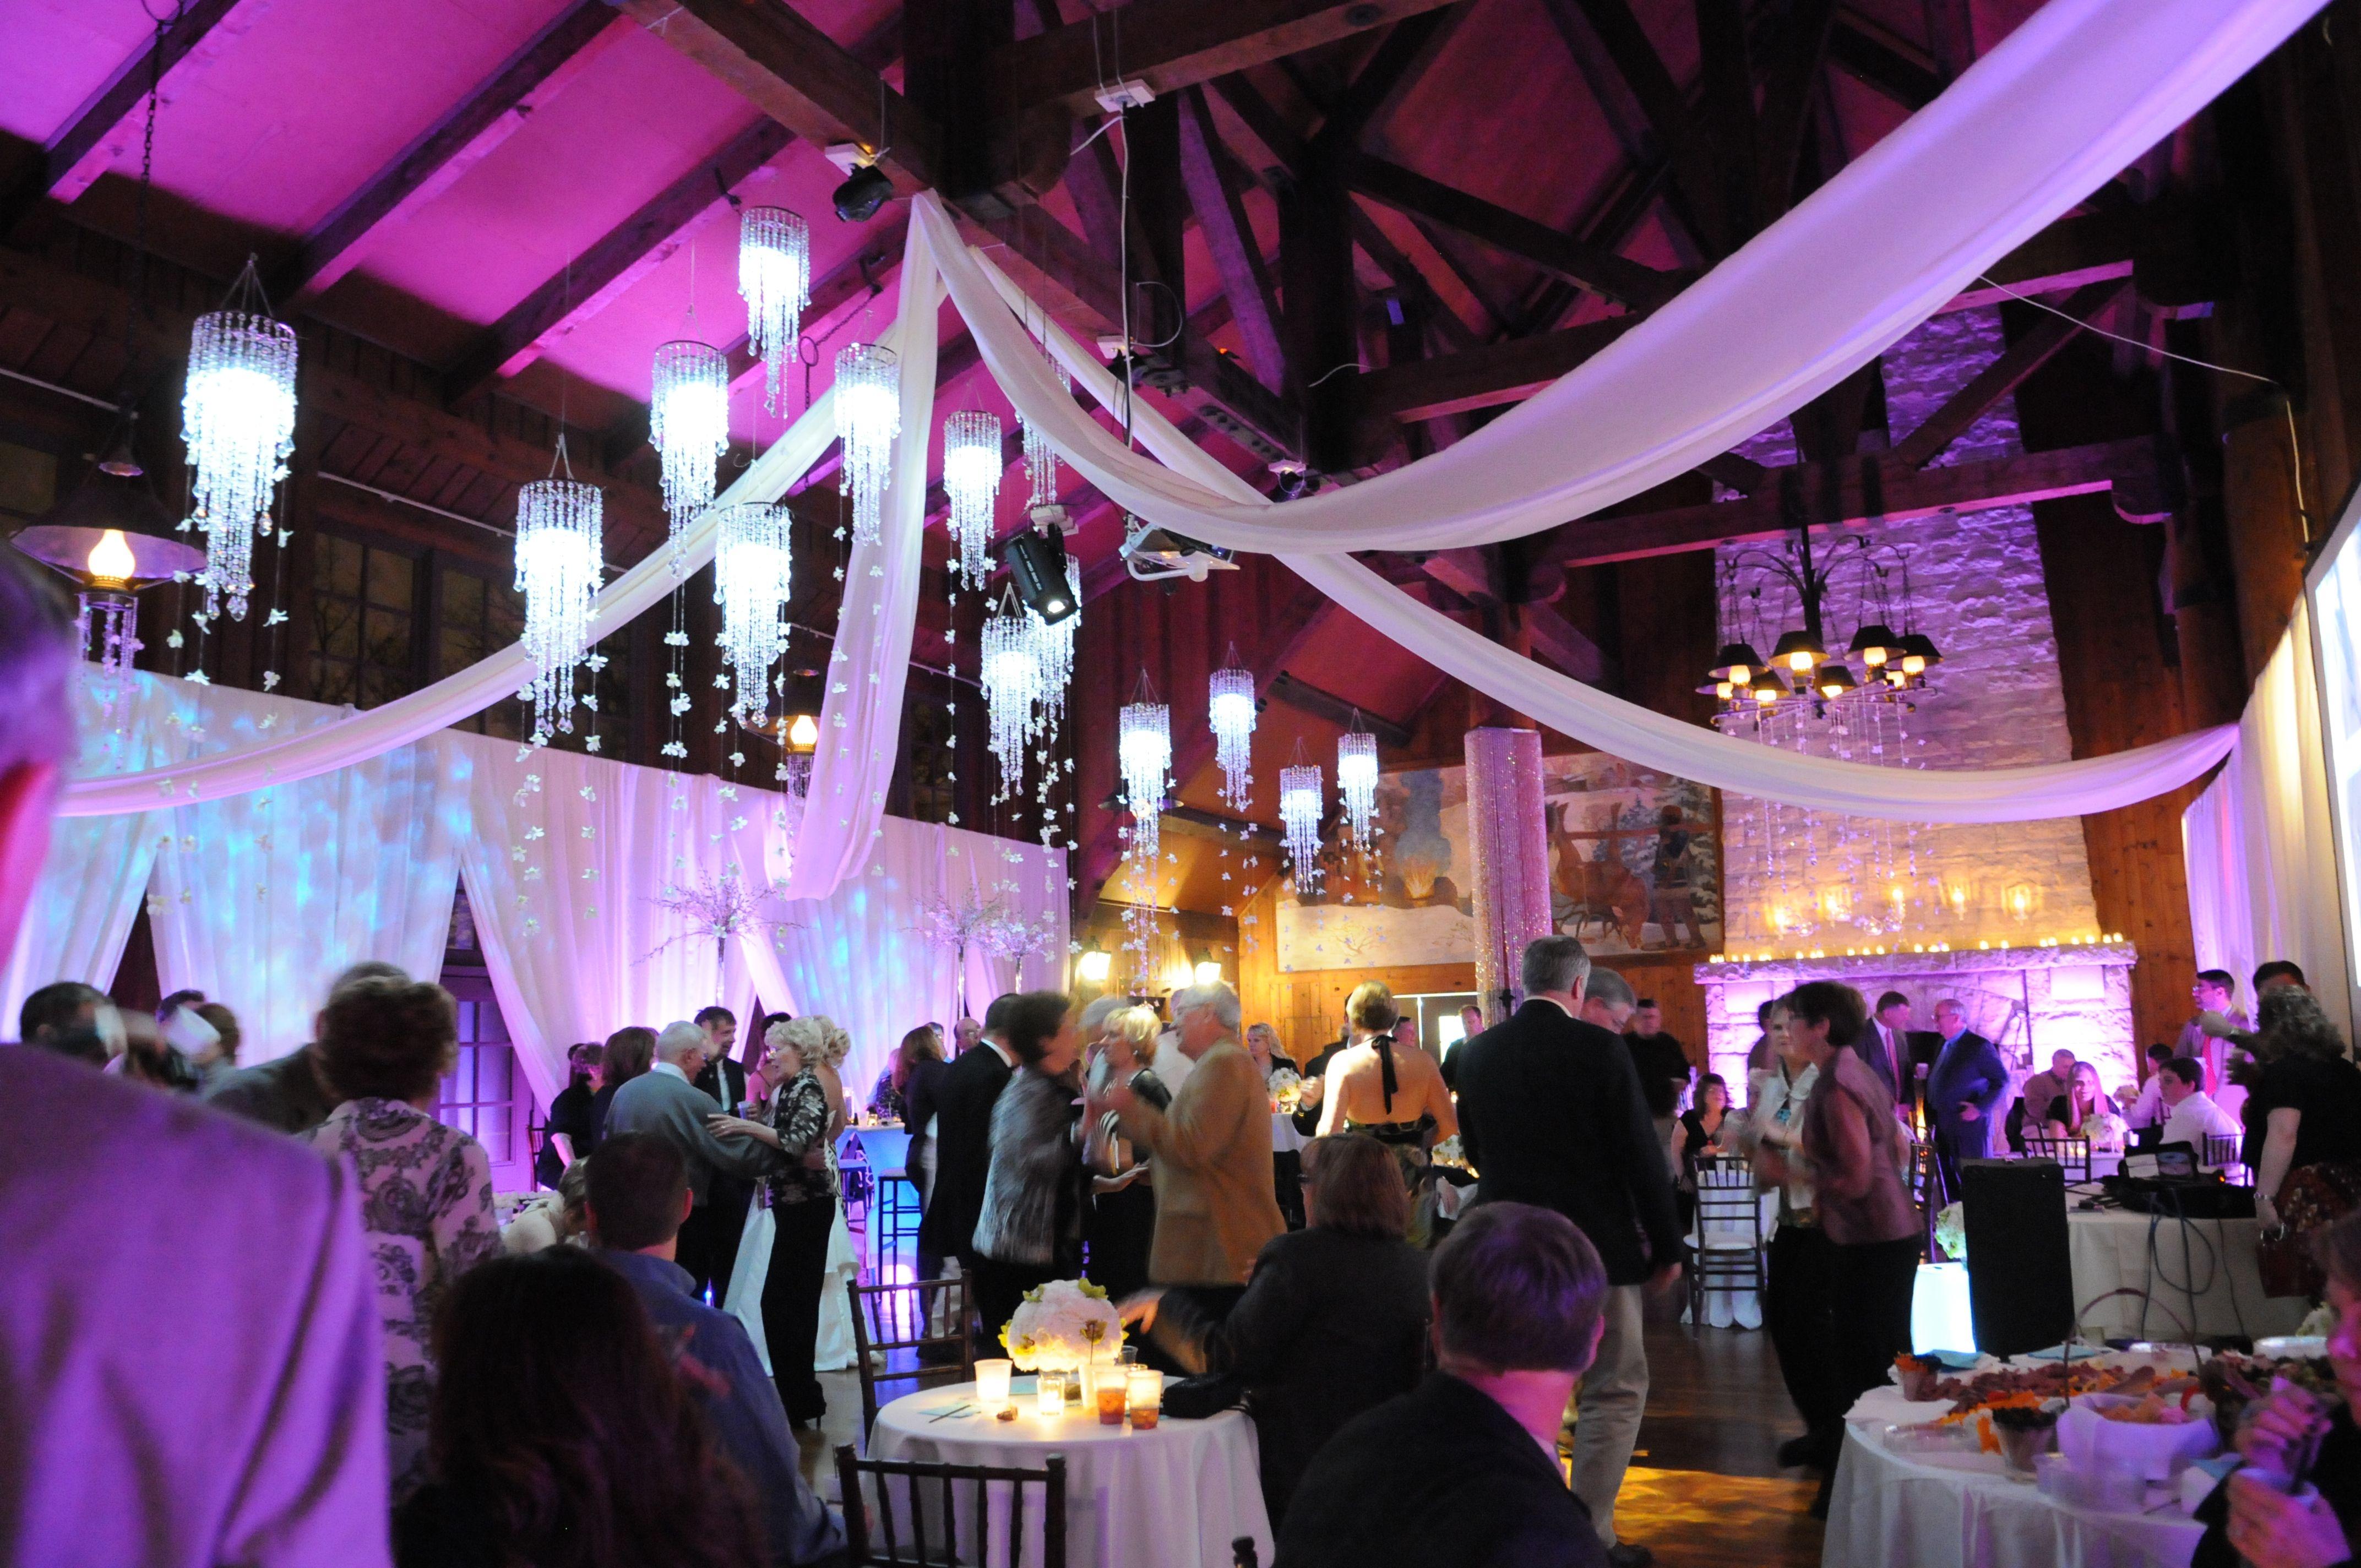 Wedding Decor Lighting Cocktail Hour Wedding Reception Watch Tower Lodge Rock Island Black Hawk State Histor Giraffe Photography Quad Cities Lodge Wedding